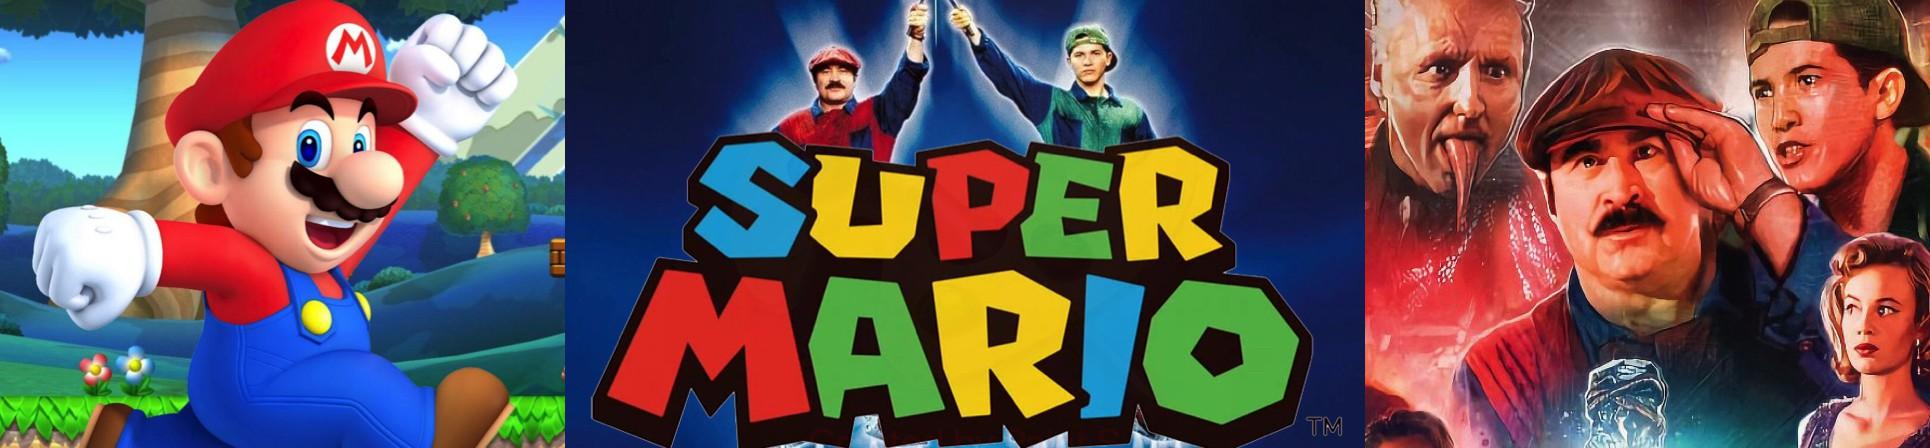 Vendita online t-shirt Super Mario Bros